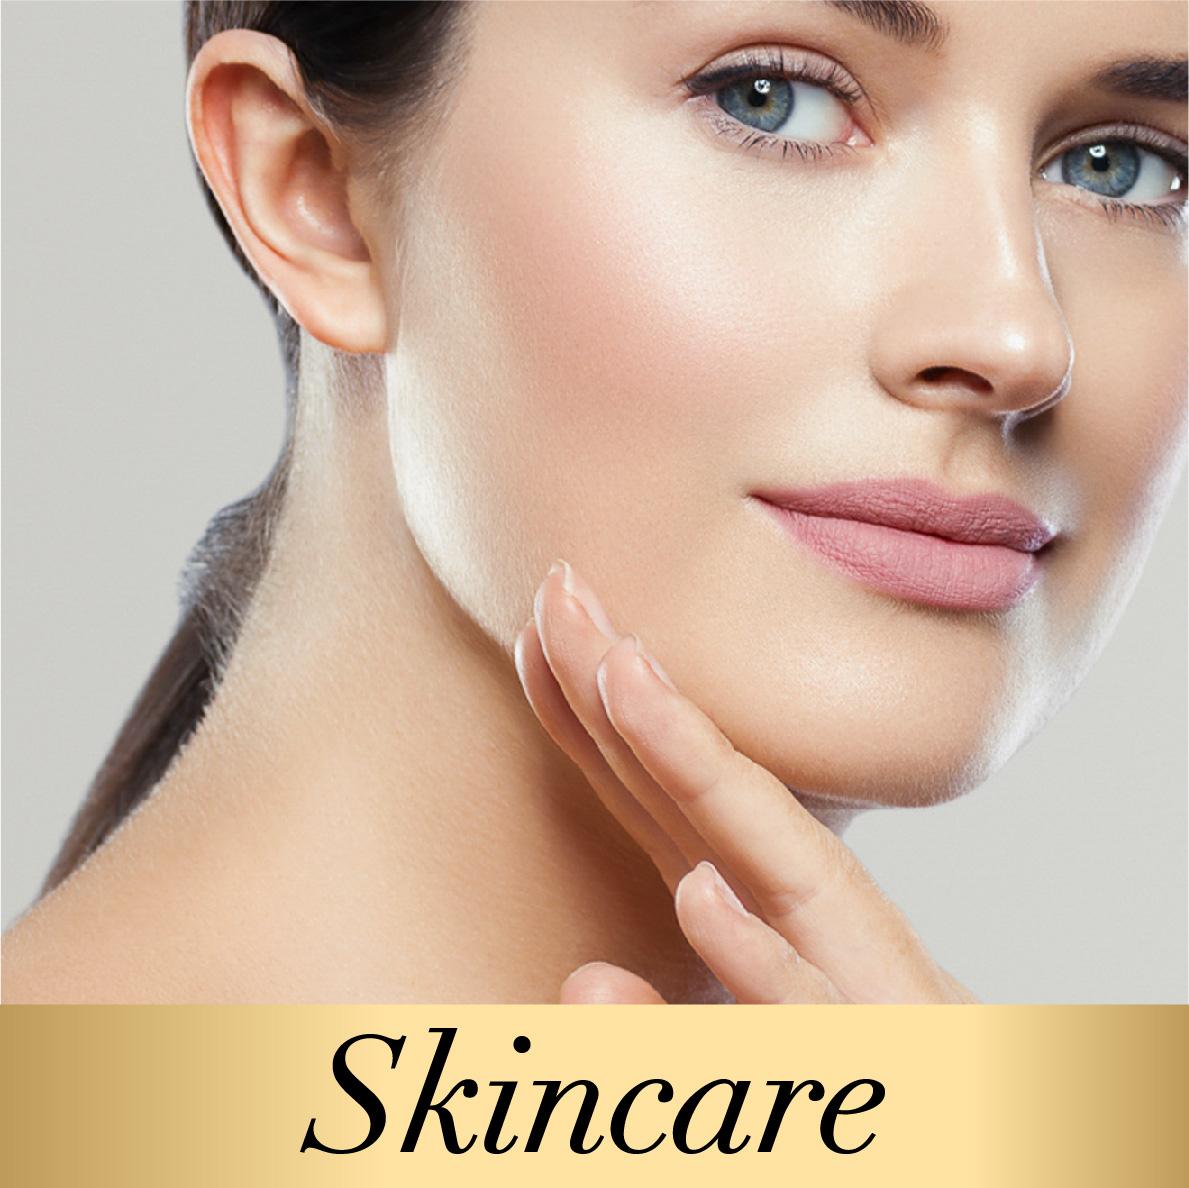 Skincare-570×570-1_1189x1188_acf_cropped